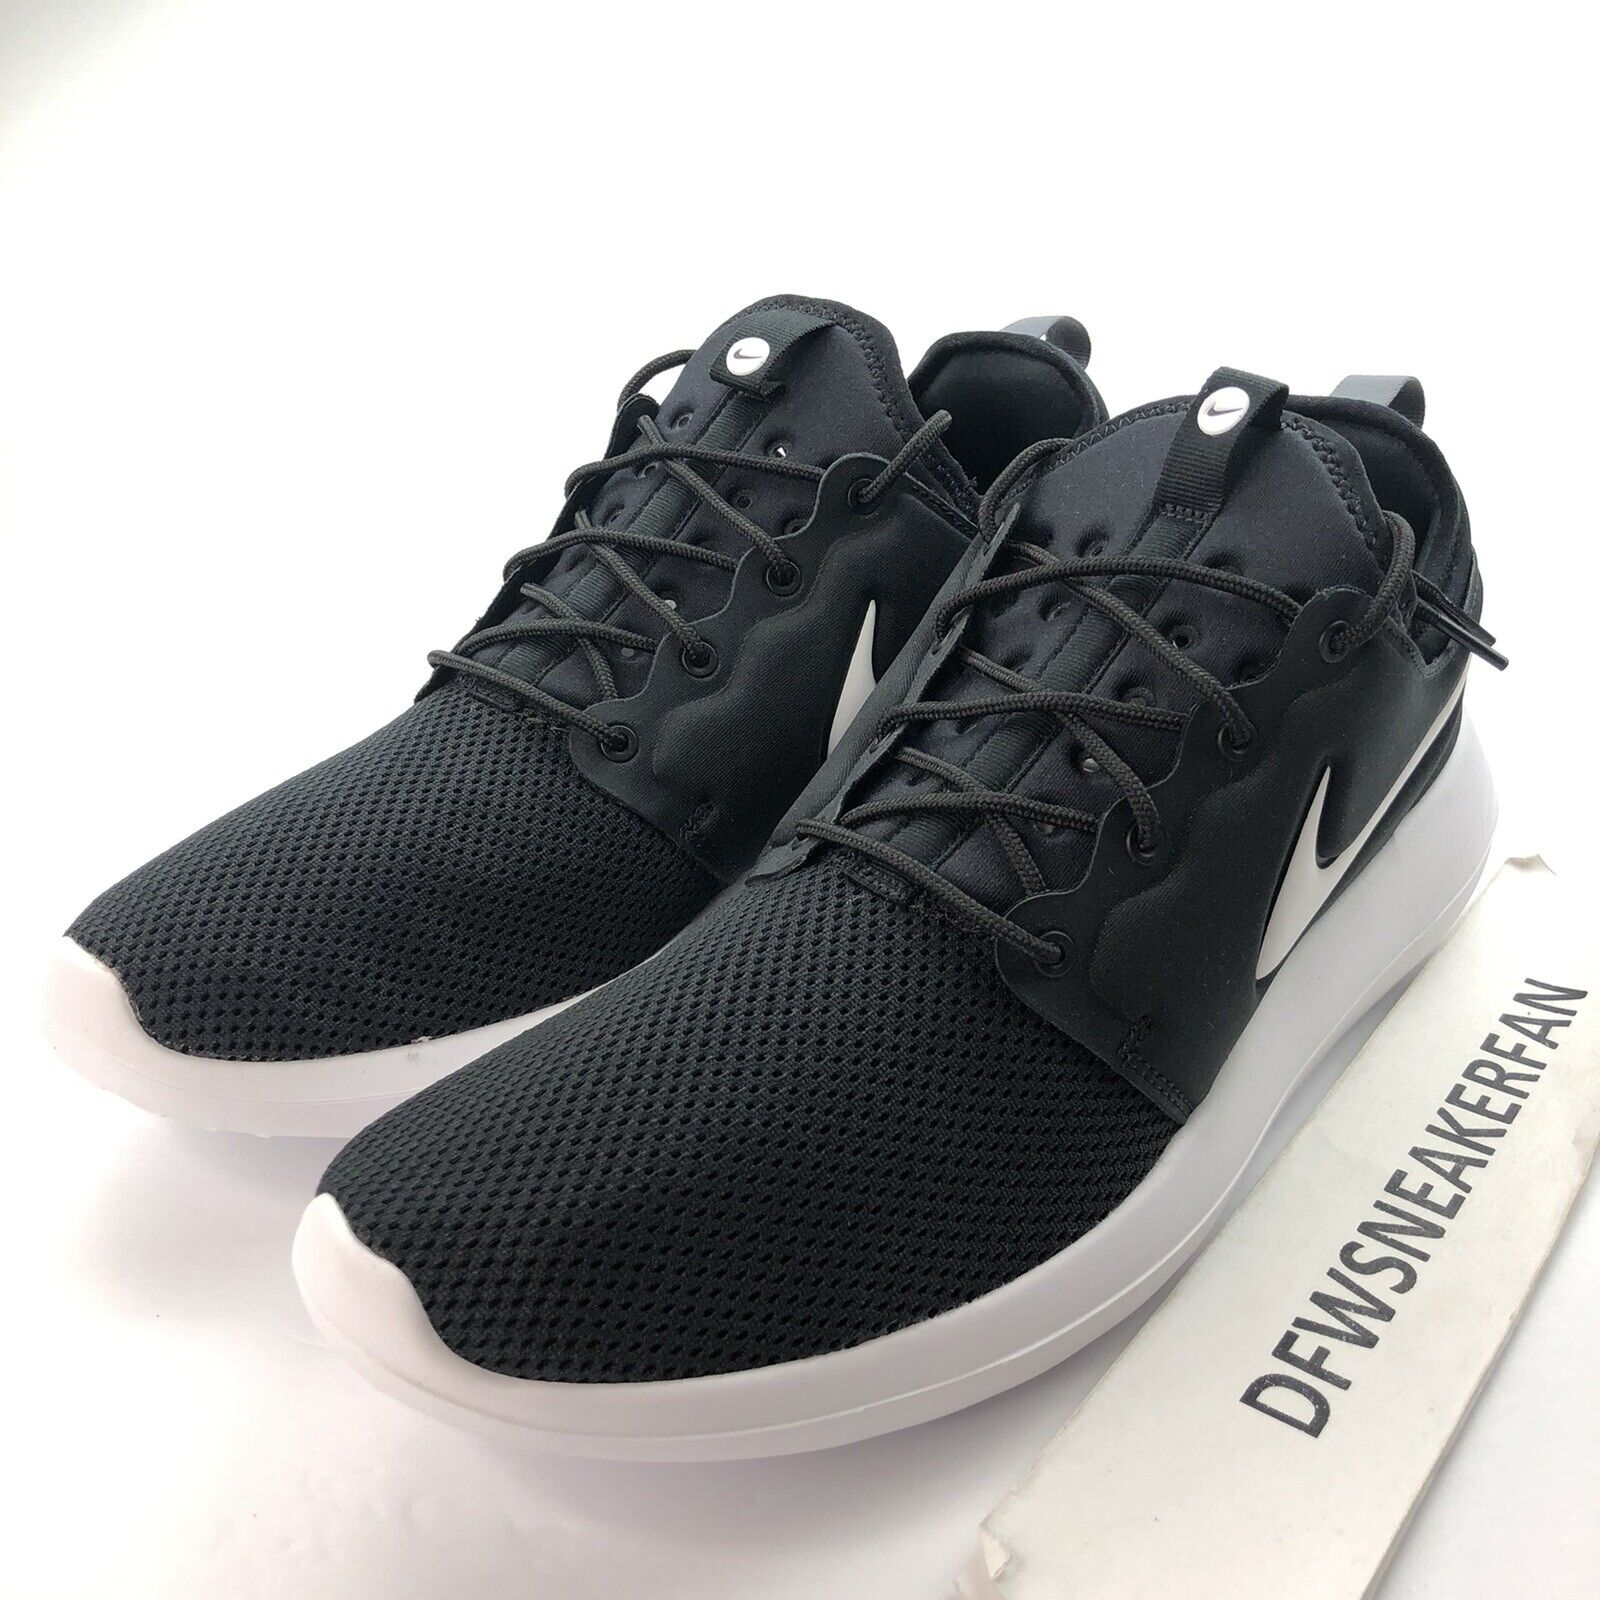 Untado Haz un experimento Experto  Nike Roshe Two 2 Black White Rosherun Men Running Shoes SNEAKERS 844656-004  12 for sale online | eBay